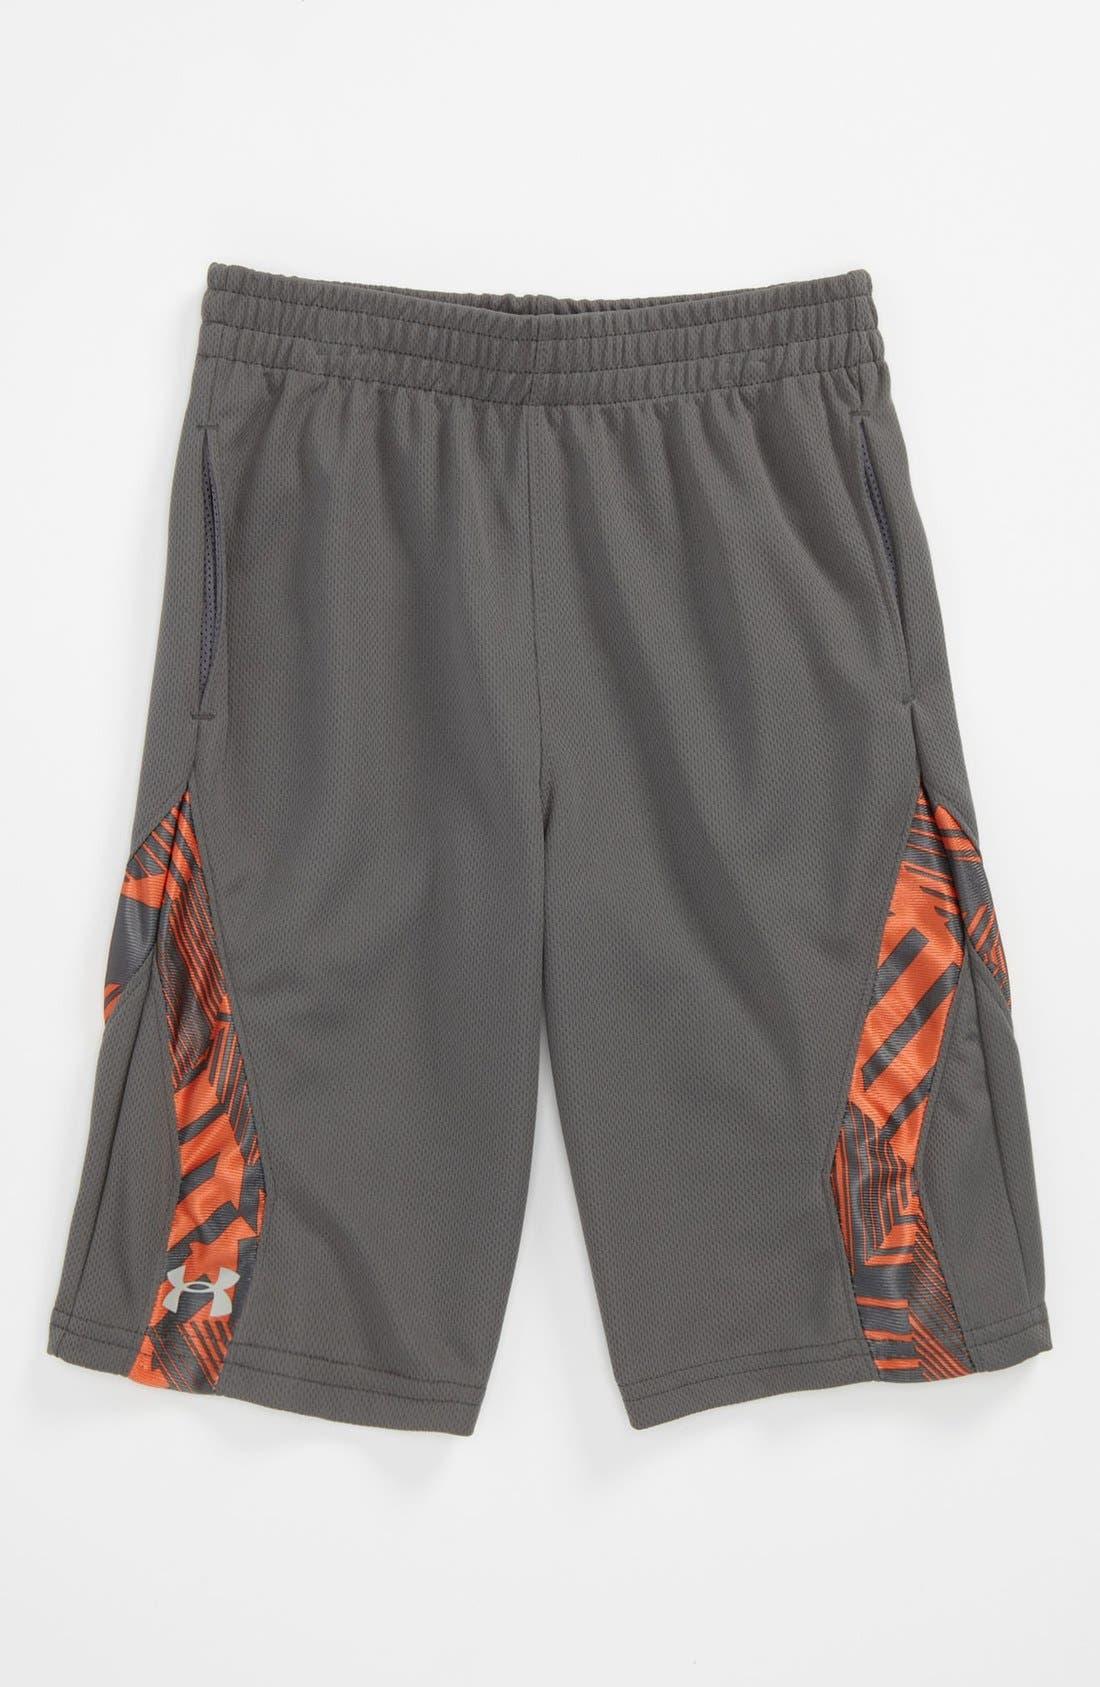 Main Image - Under Armour Shorts (Little Boys)